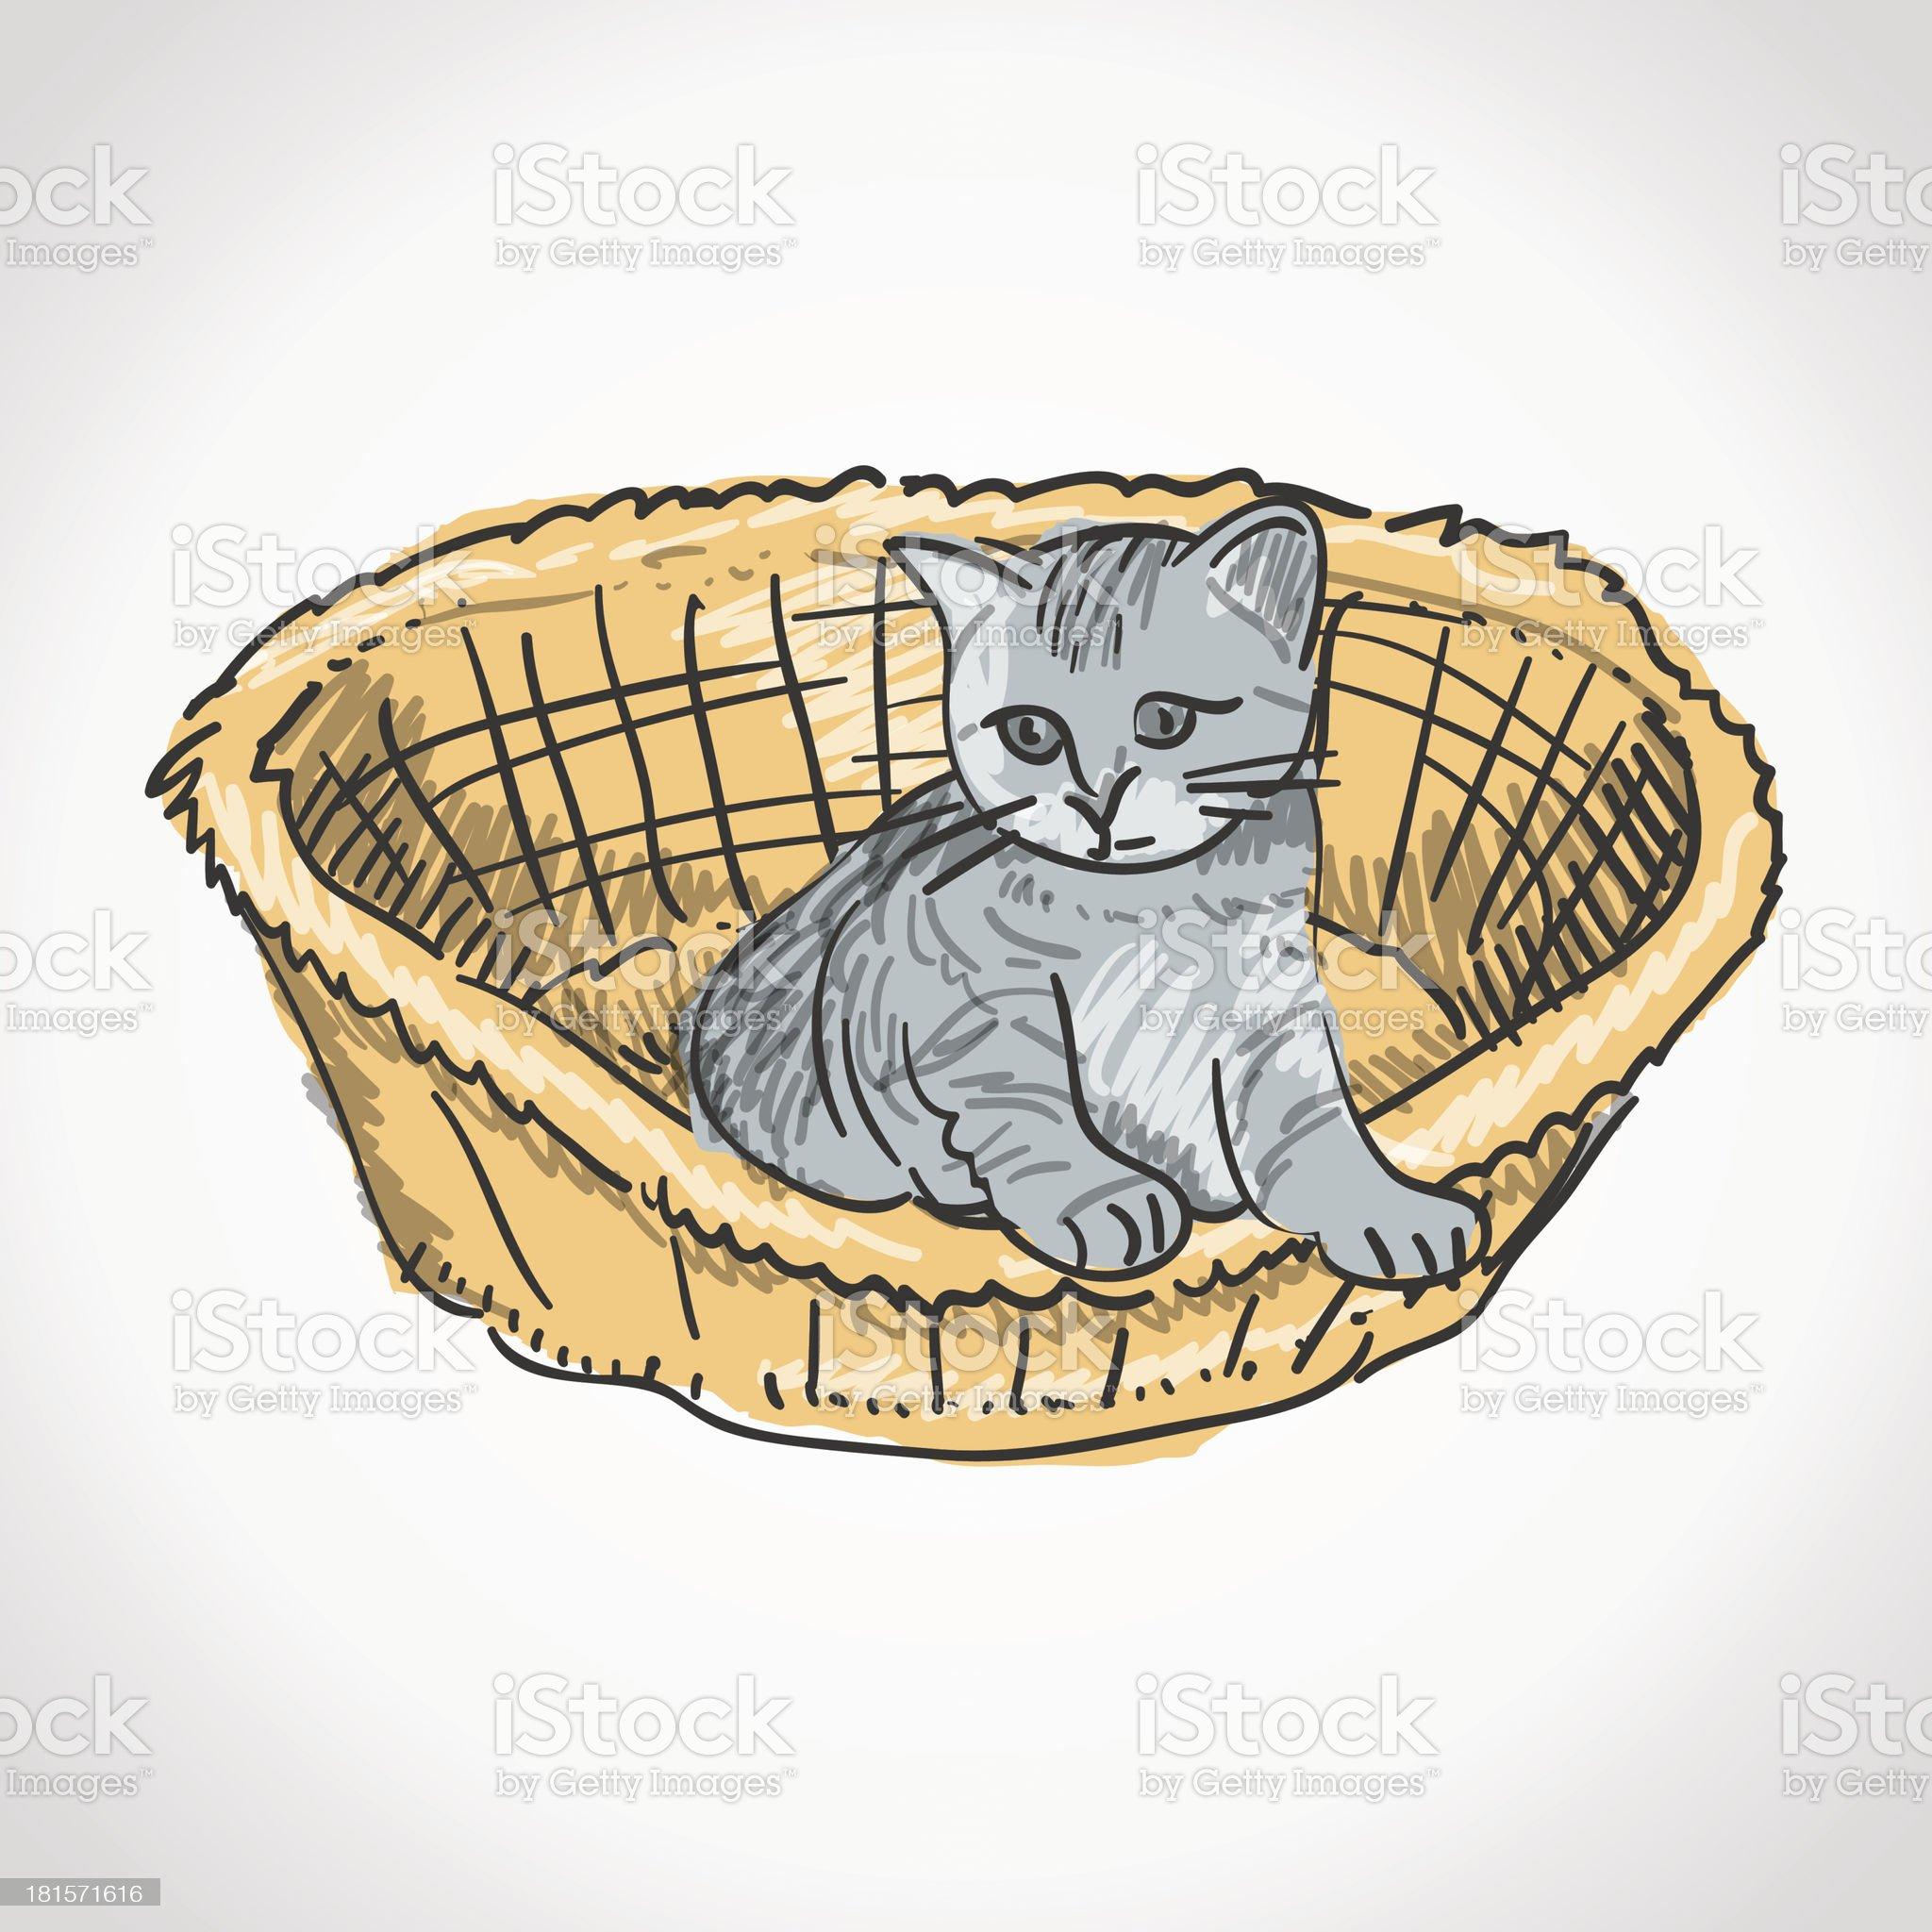 Kitten in Basket royalty-free stock vector art